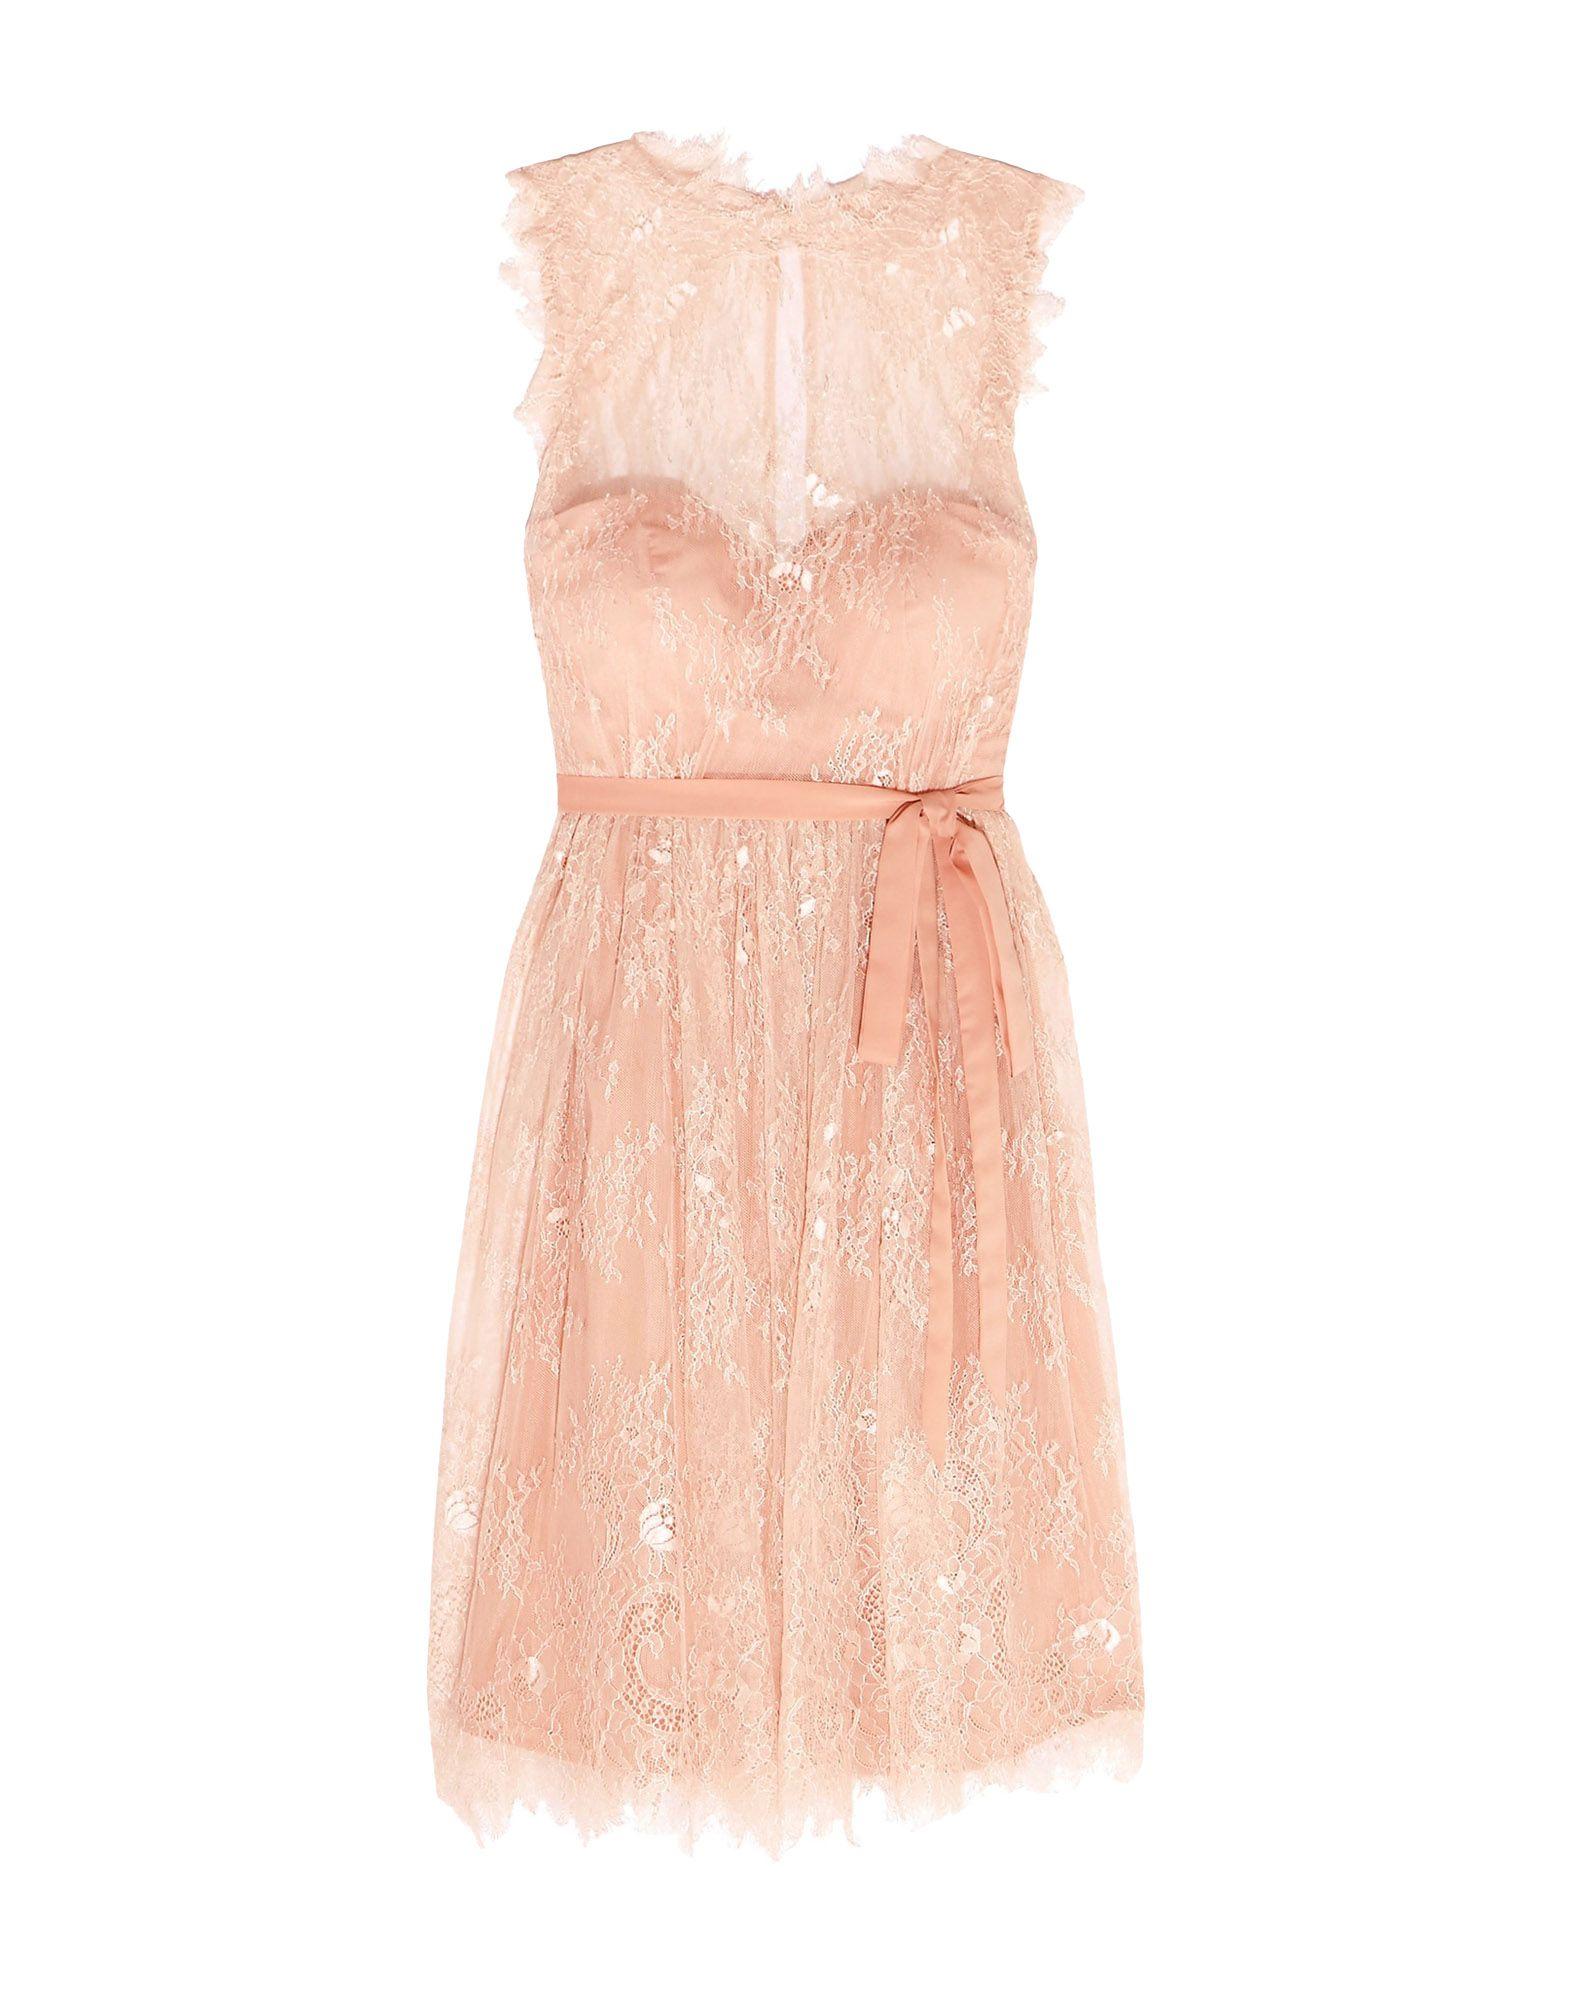 8c6676859d88 Γυναικεία Φορέματα με Δαντέλα Online - Ακριβότερα Προϊόντα - Σελίδα 112